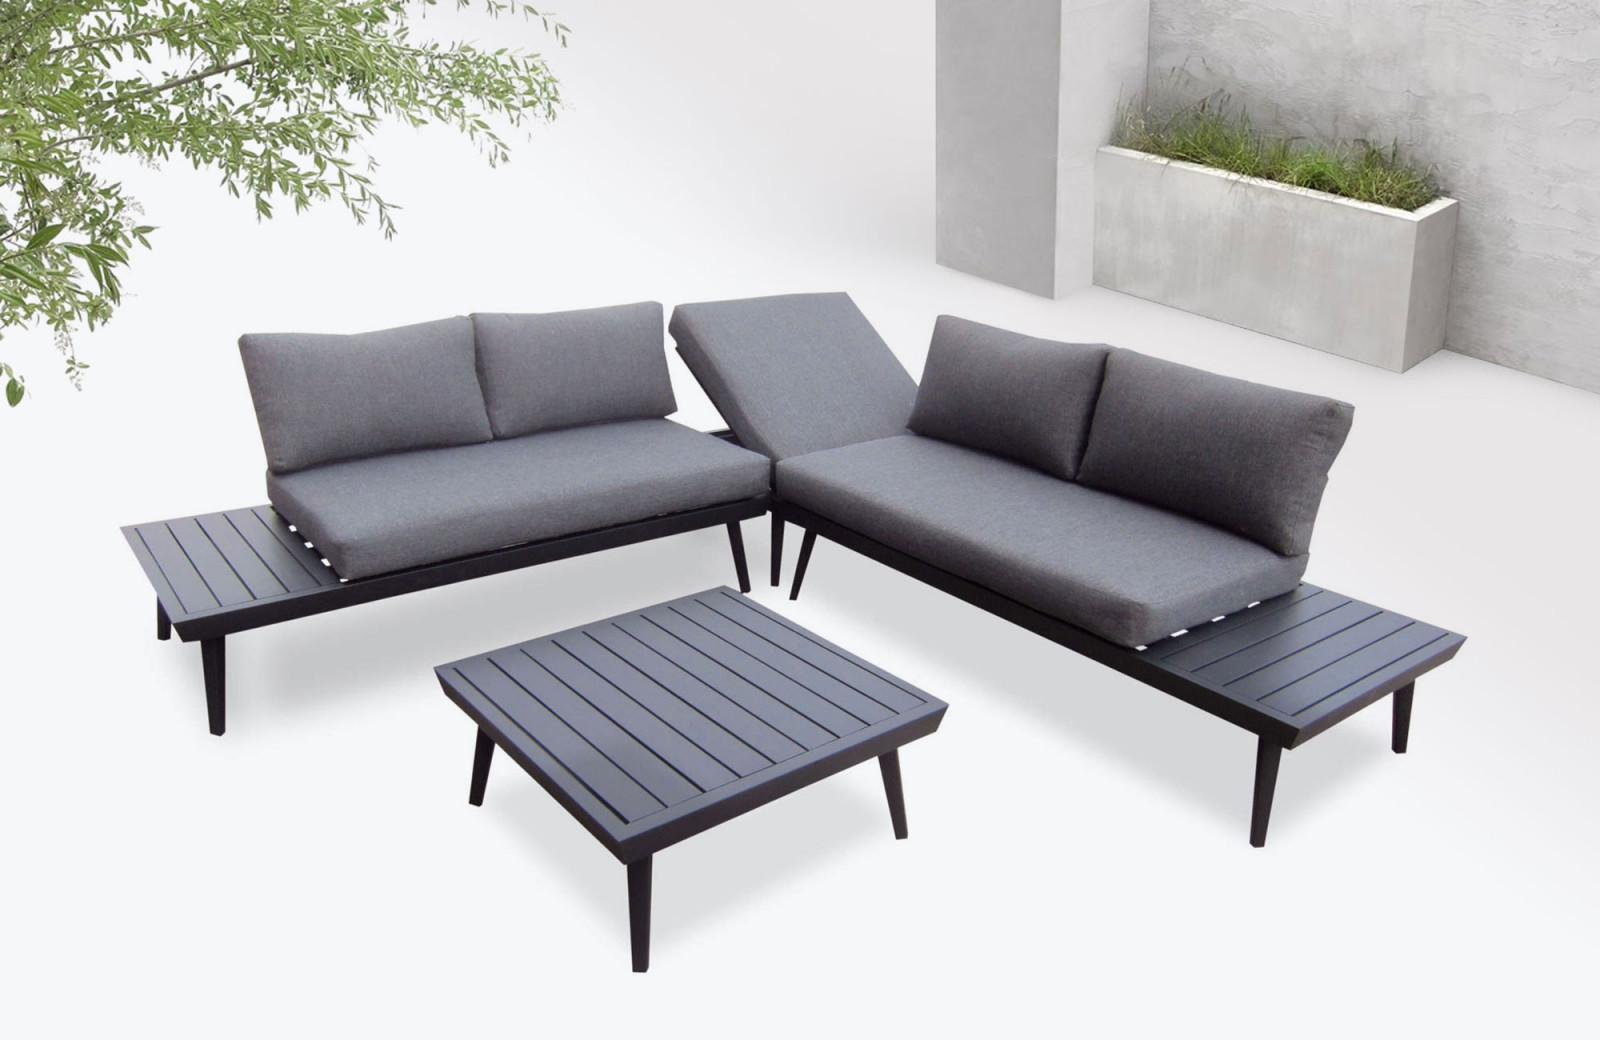 Salon Jardin Luxe Garden Furniture Aluminium Vigo Of 20 Beau Salon Jardin